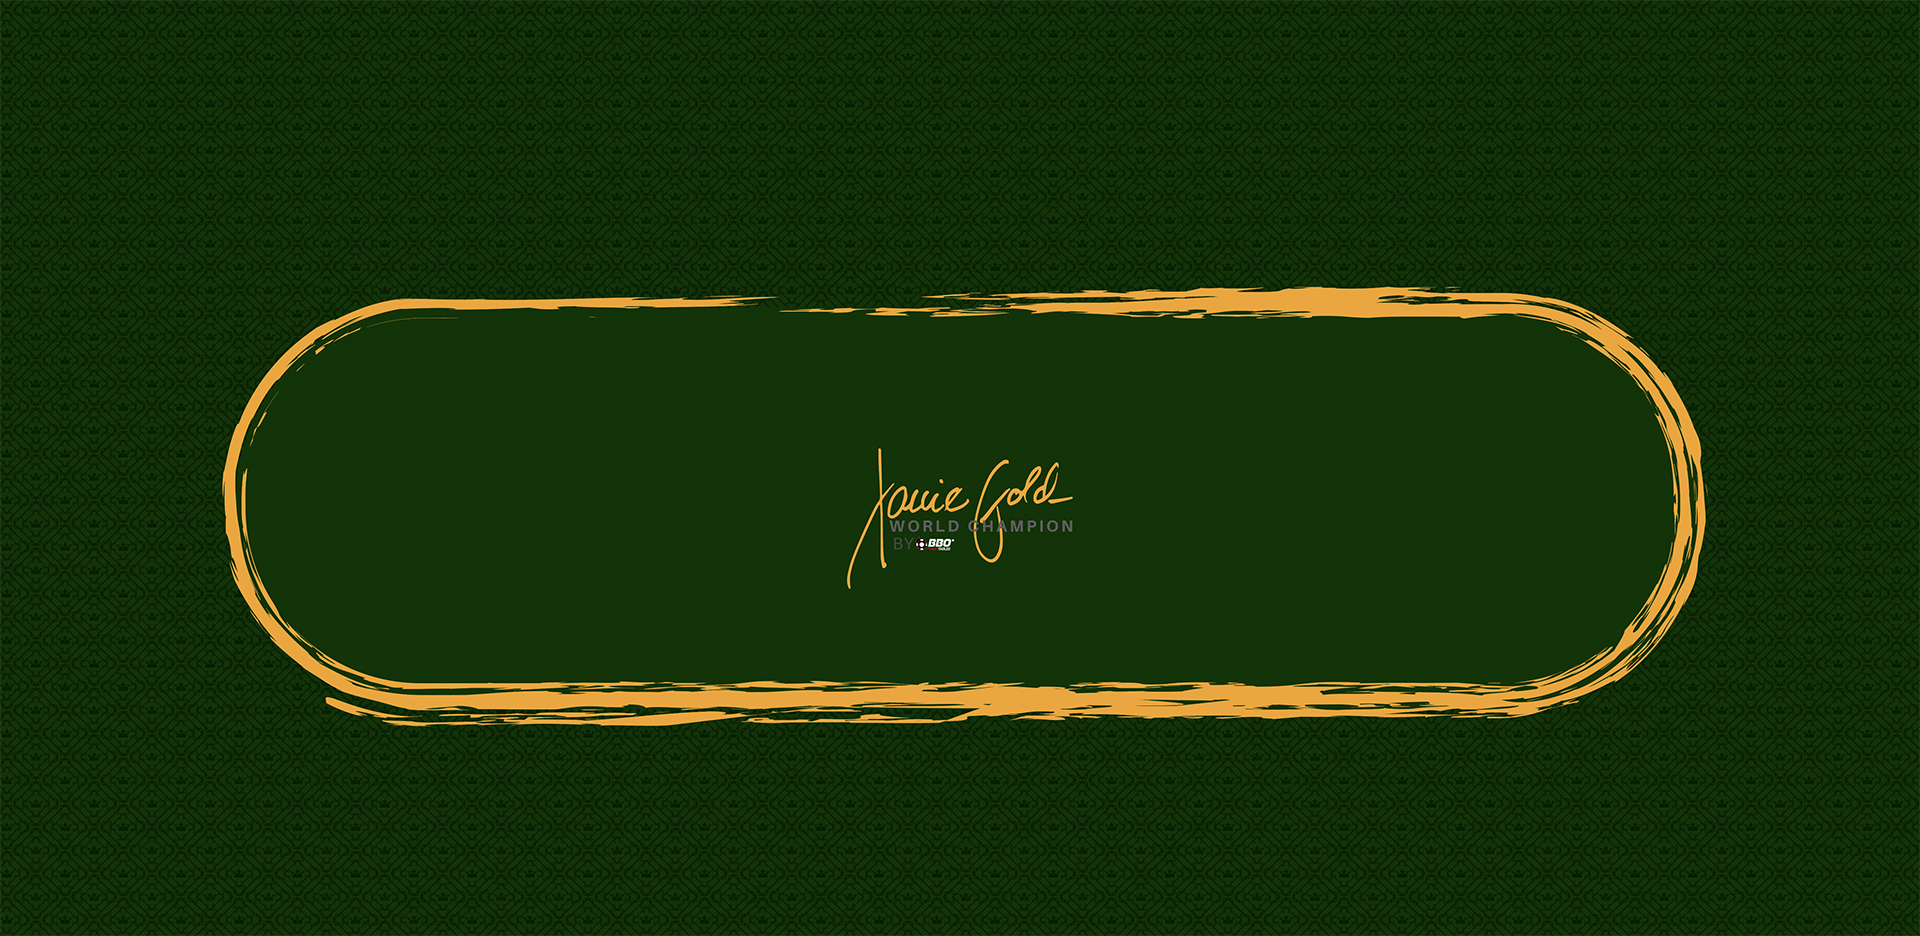 Championship Edition - Green